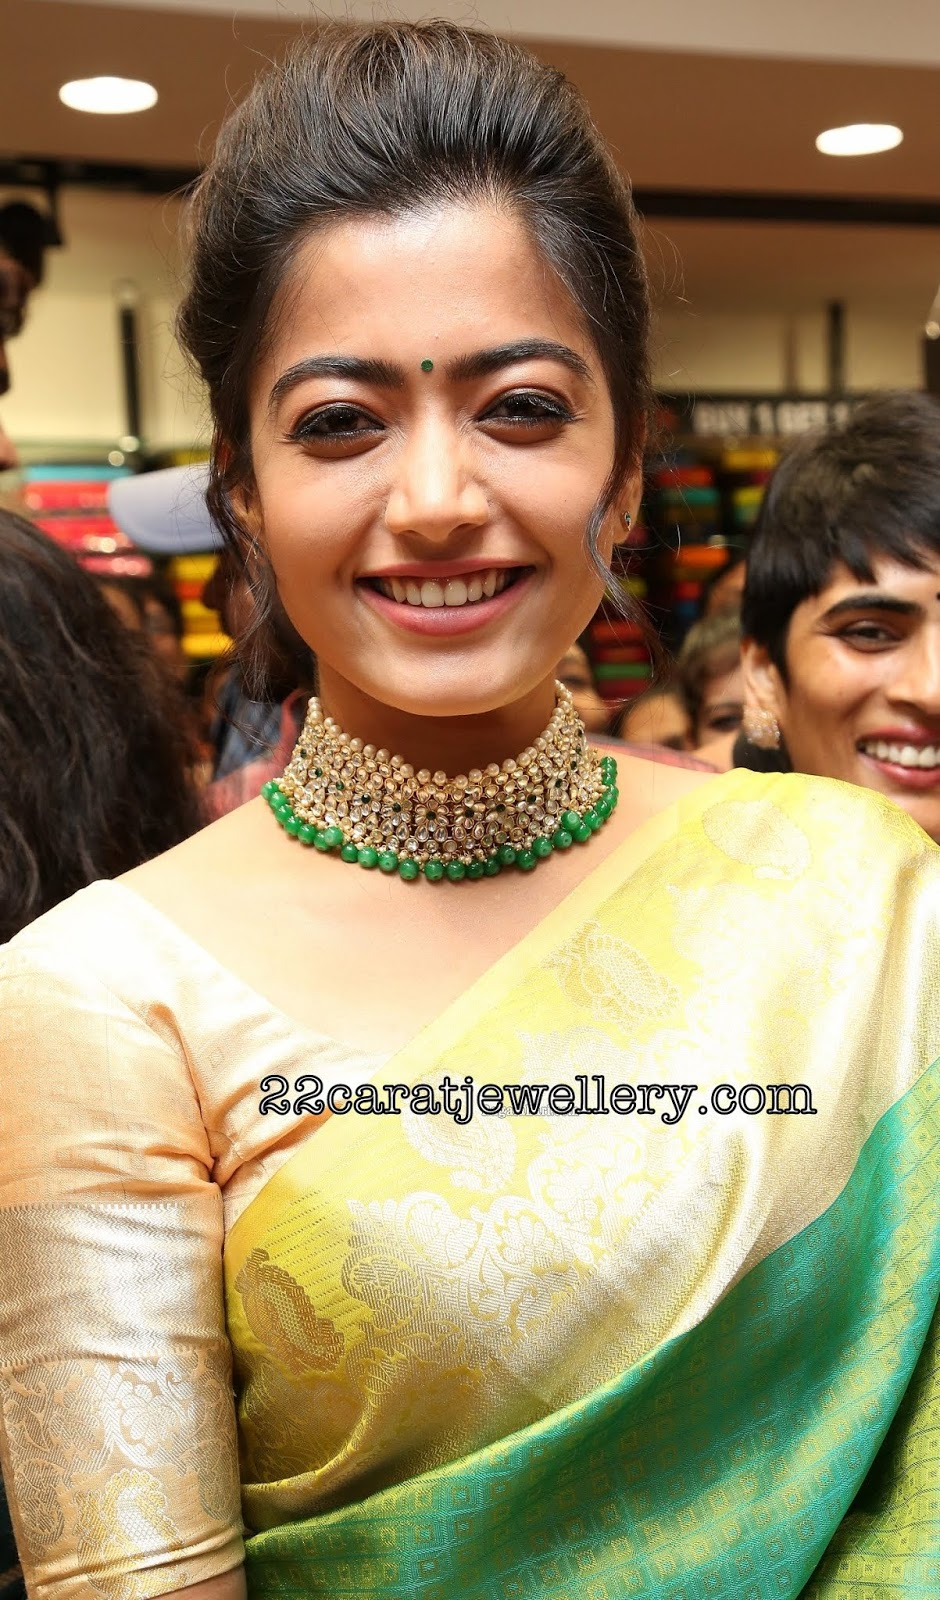 Rashmika Mandanna In Polki Choker Jewellery Designs Rashmika mandanna (@iamrashmika) on tiktok | 4.8m likes. rashmika mandanna in polki choker